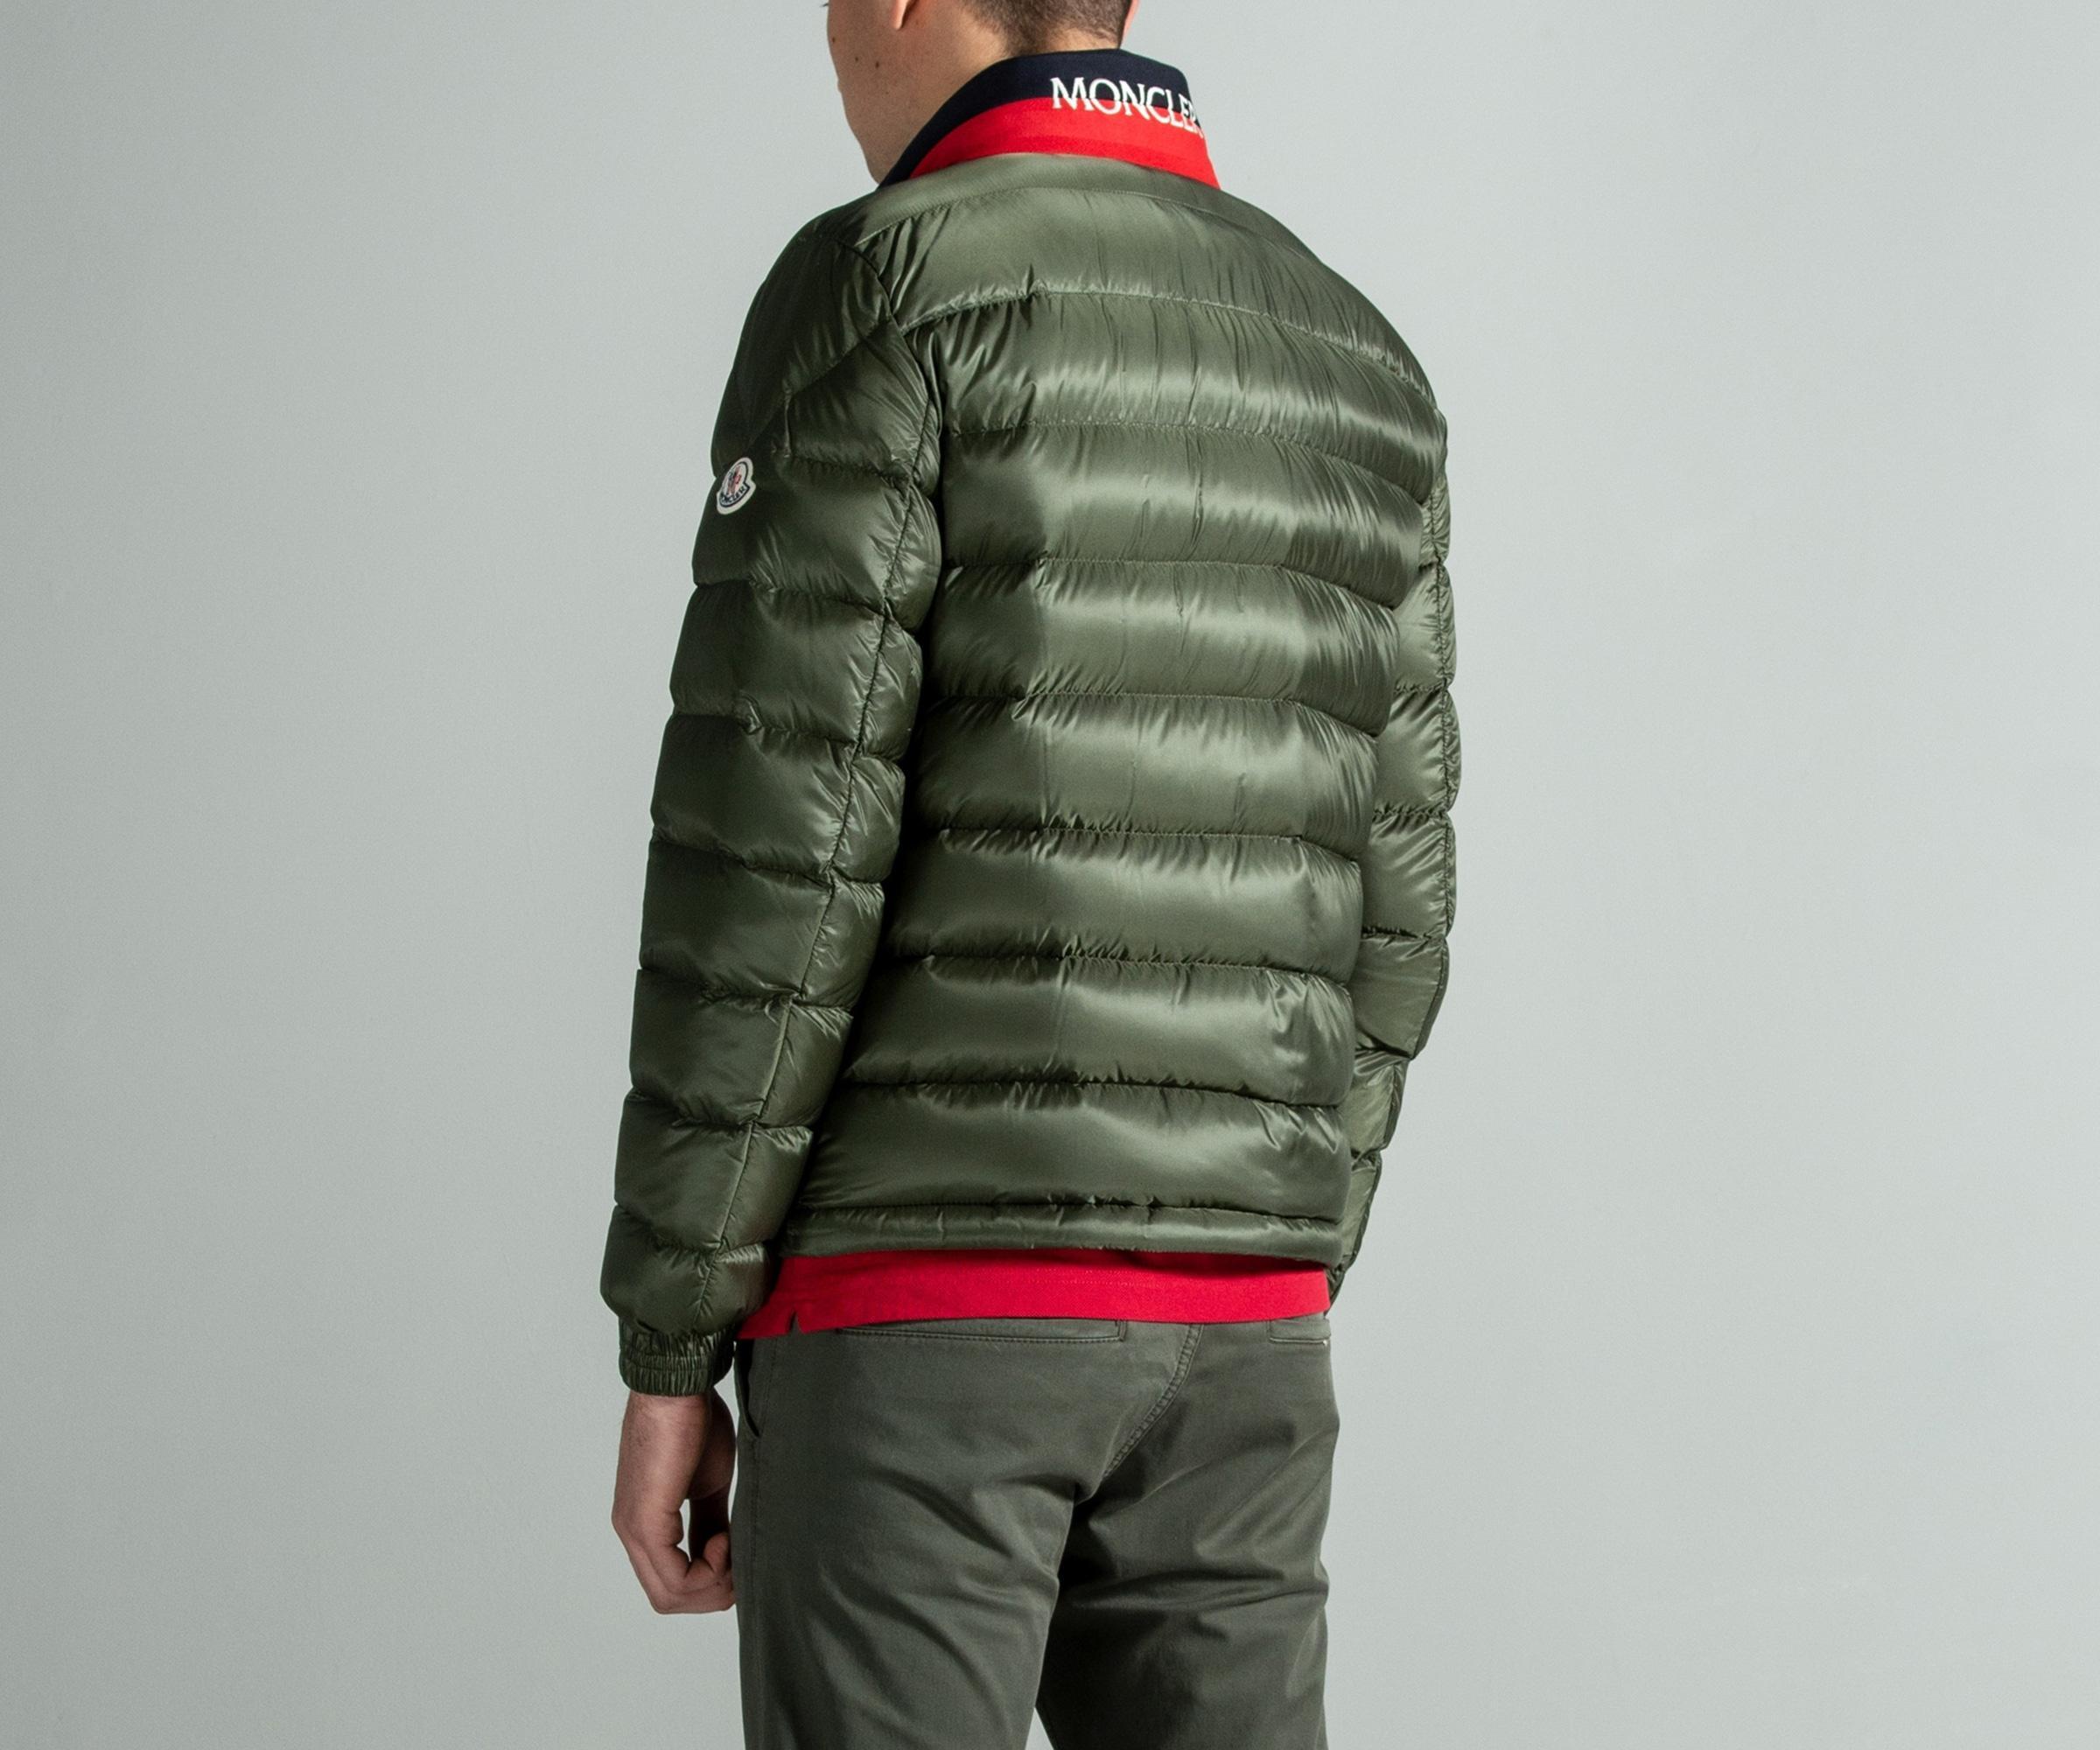 5c07bbee7 Moncler 'rodez' Biker Down Bomber Jacket Khaki in Green for Men - Lyst